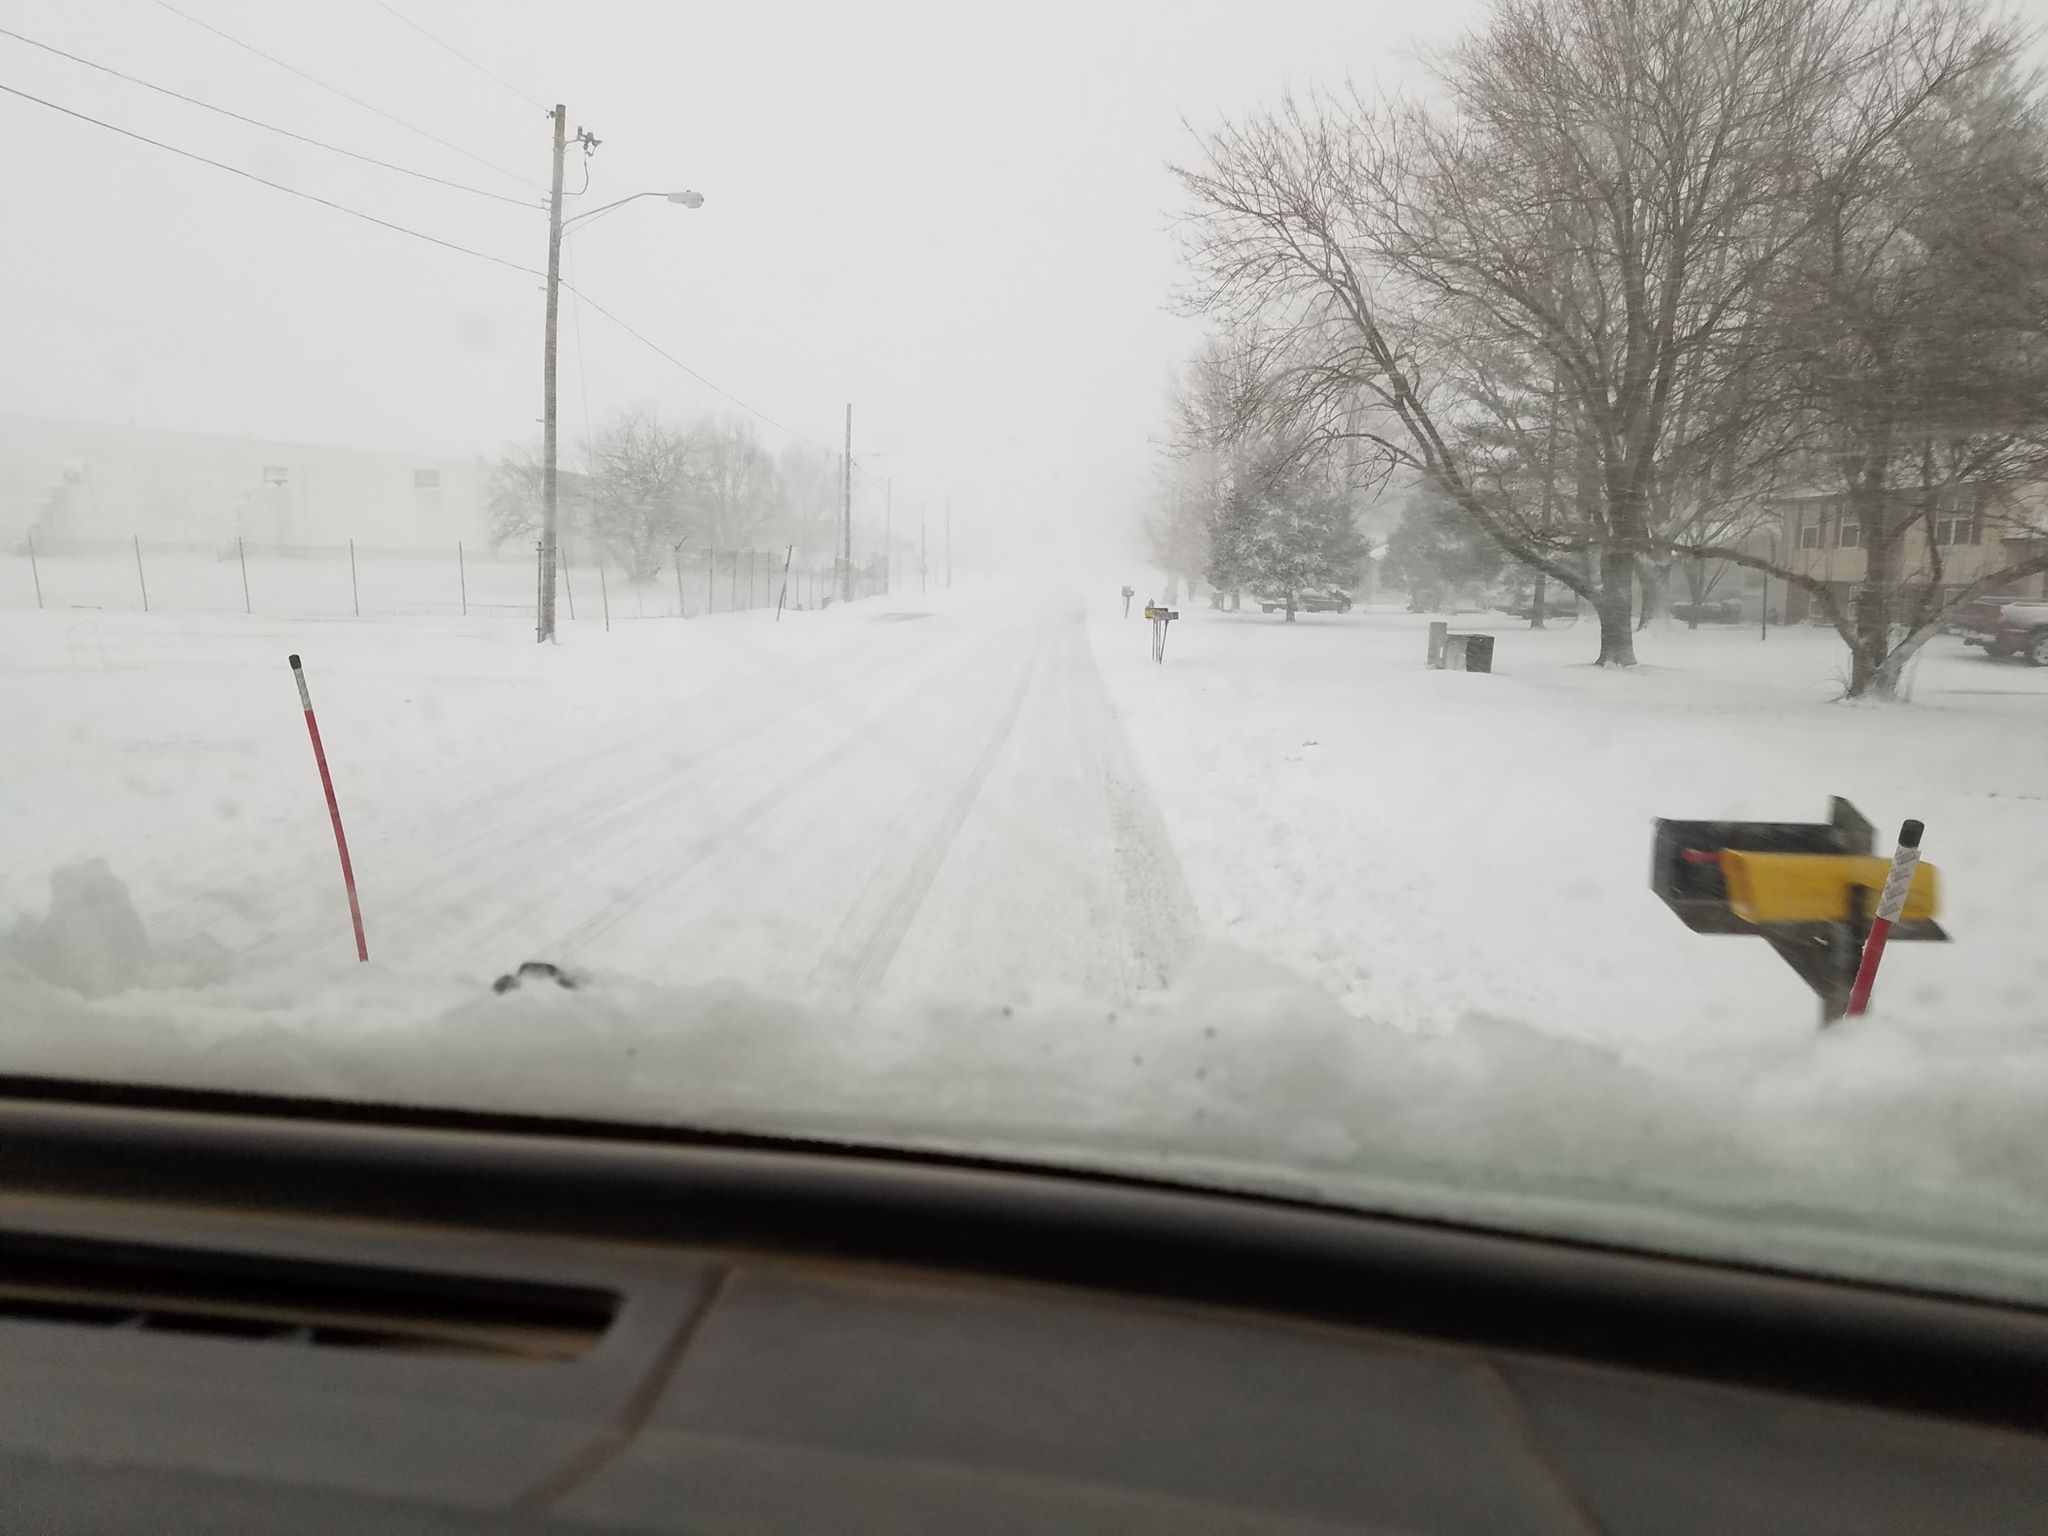 Summary of snow event on January 19, 2019